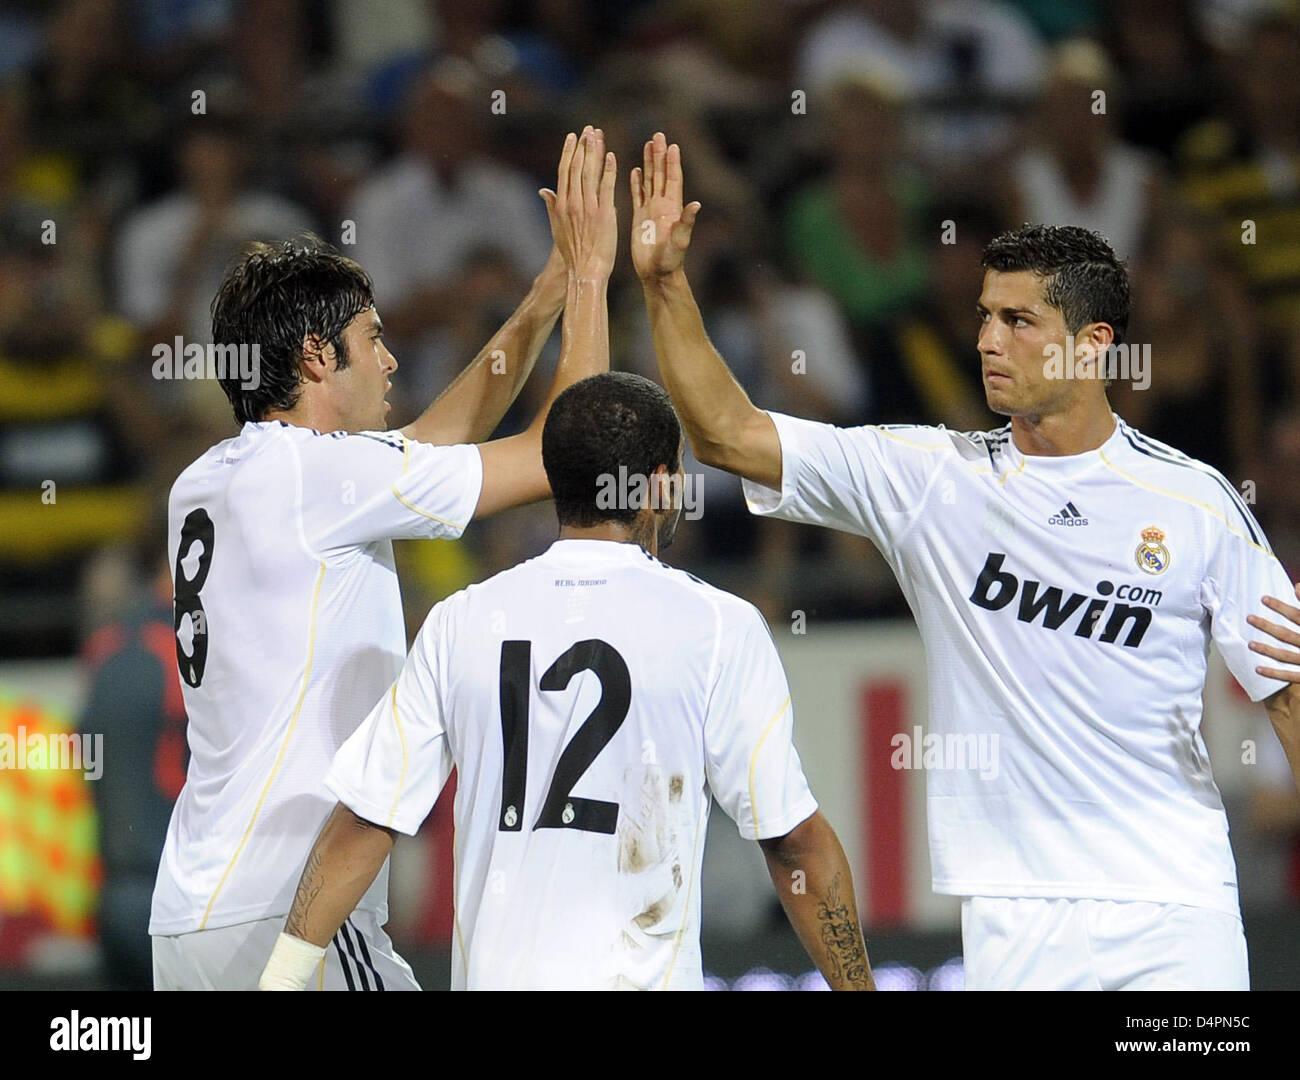 97055721def4 Madrid?s Kaka (L-R), Marcelo Vieira da Silva Junior and Cristiano Ronaldo  celebrate the 4-0 score during the friendly match Borussia Dortmund vs Real  Madrid ...